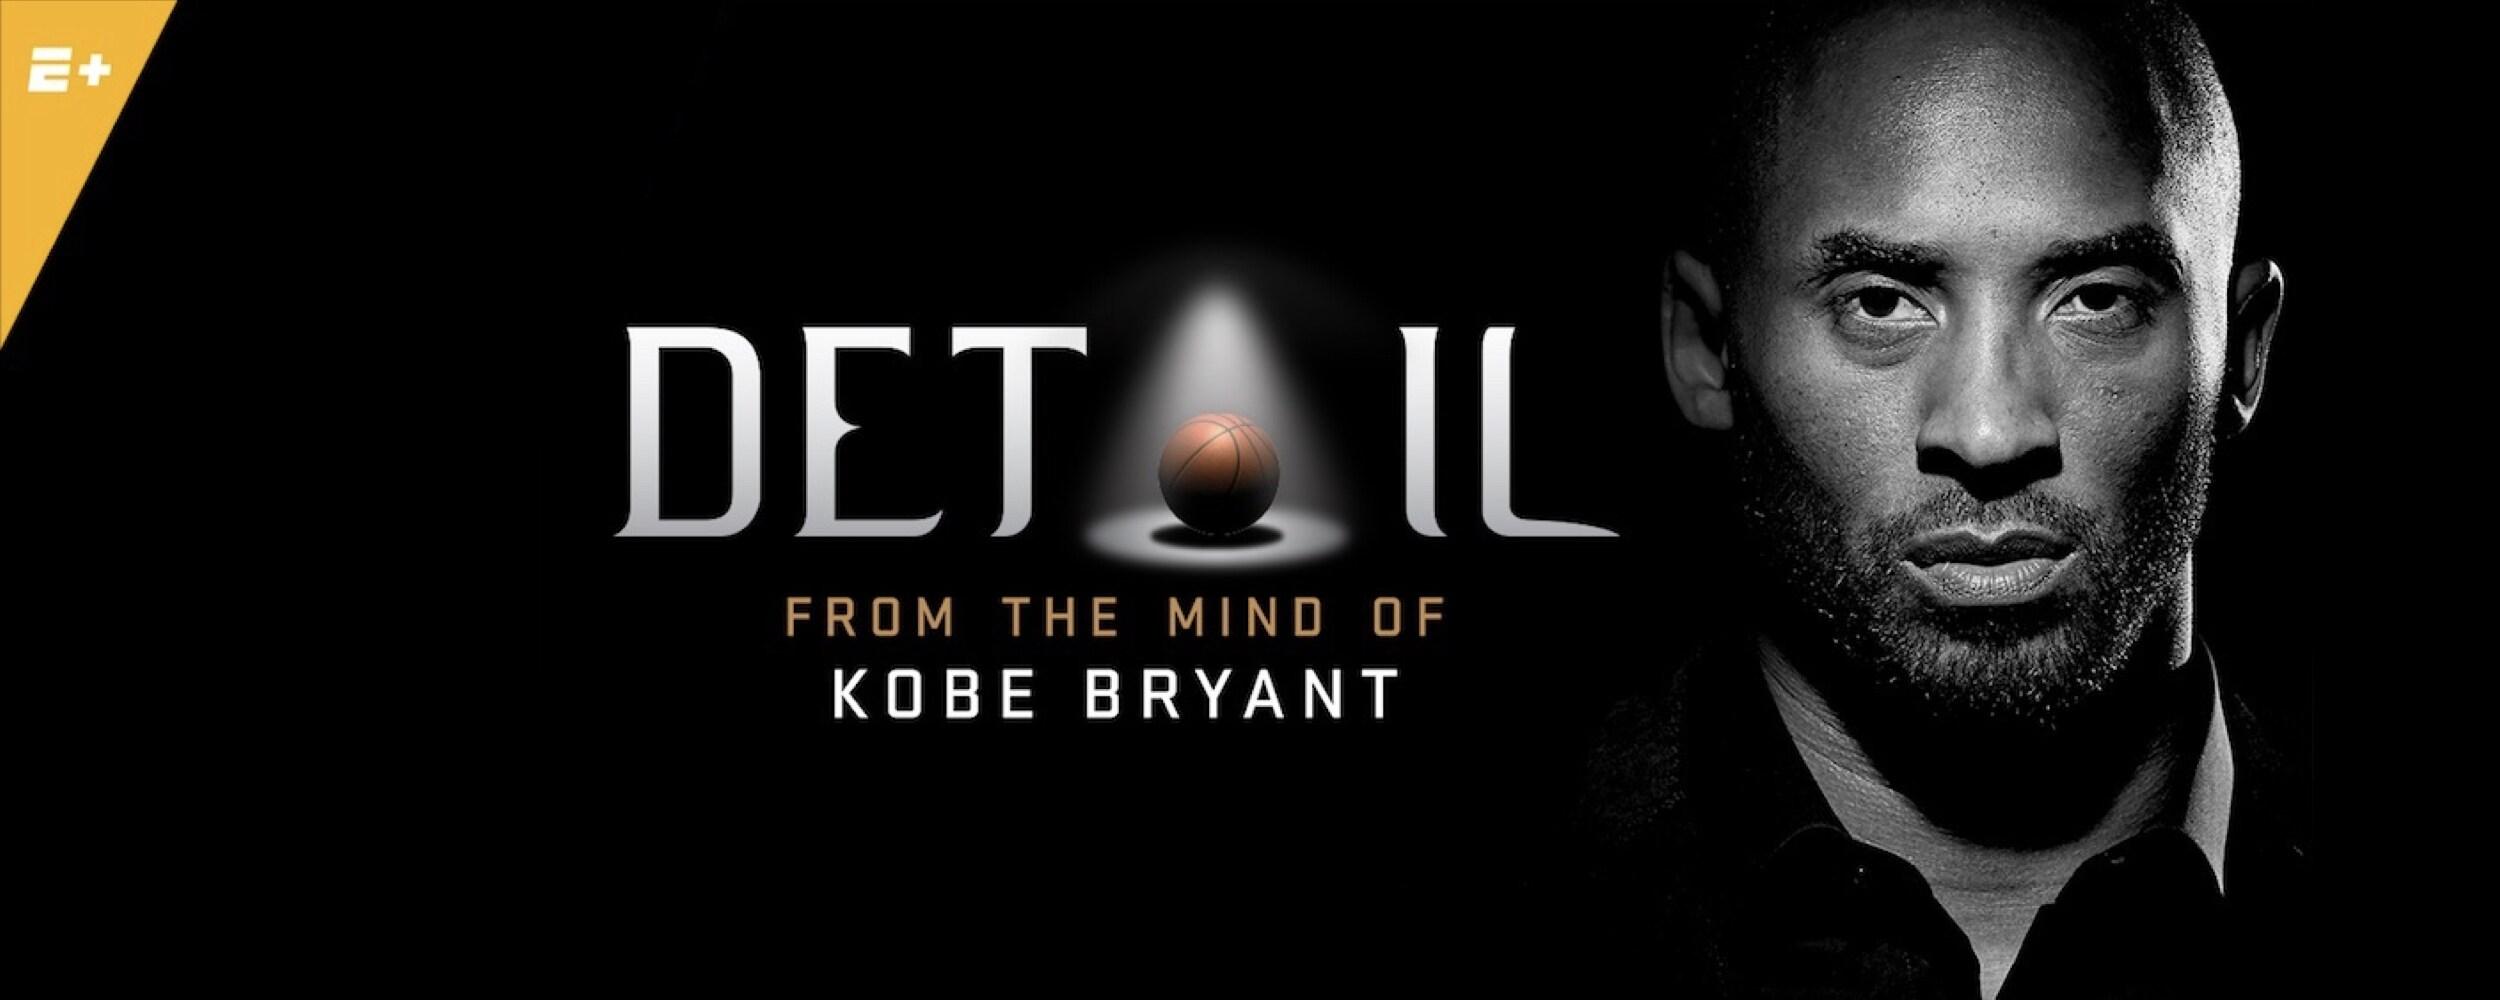 Kobe Bryant's Detail Returns for New Season Exclusively on